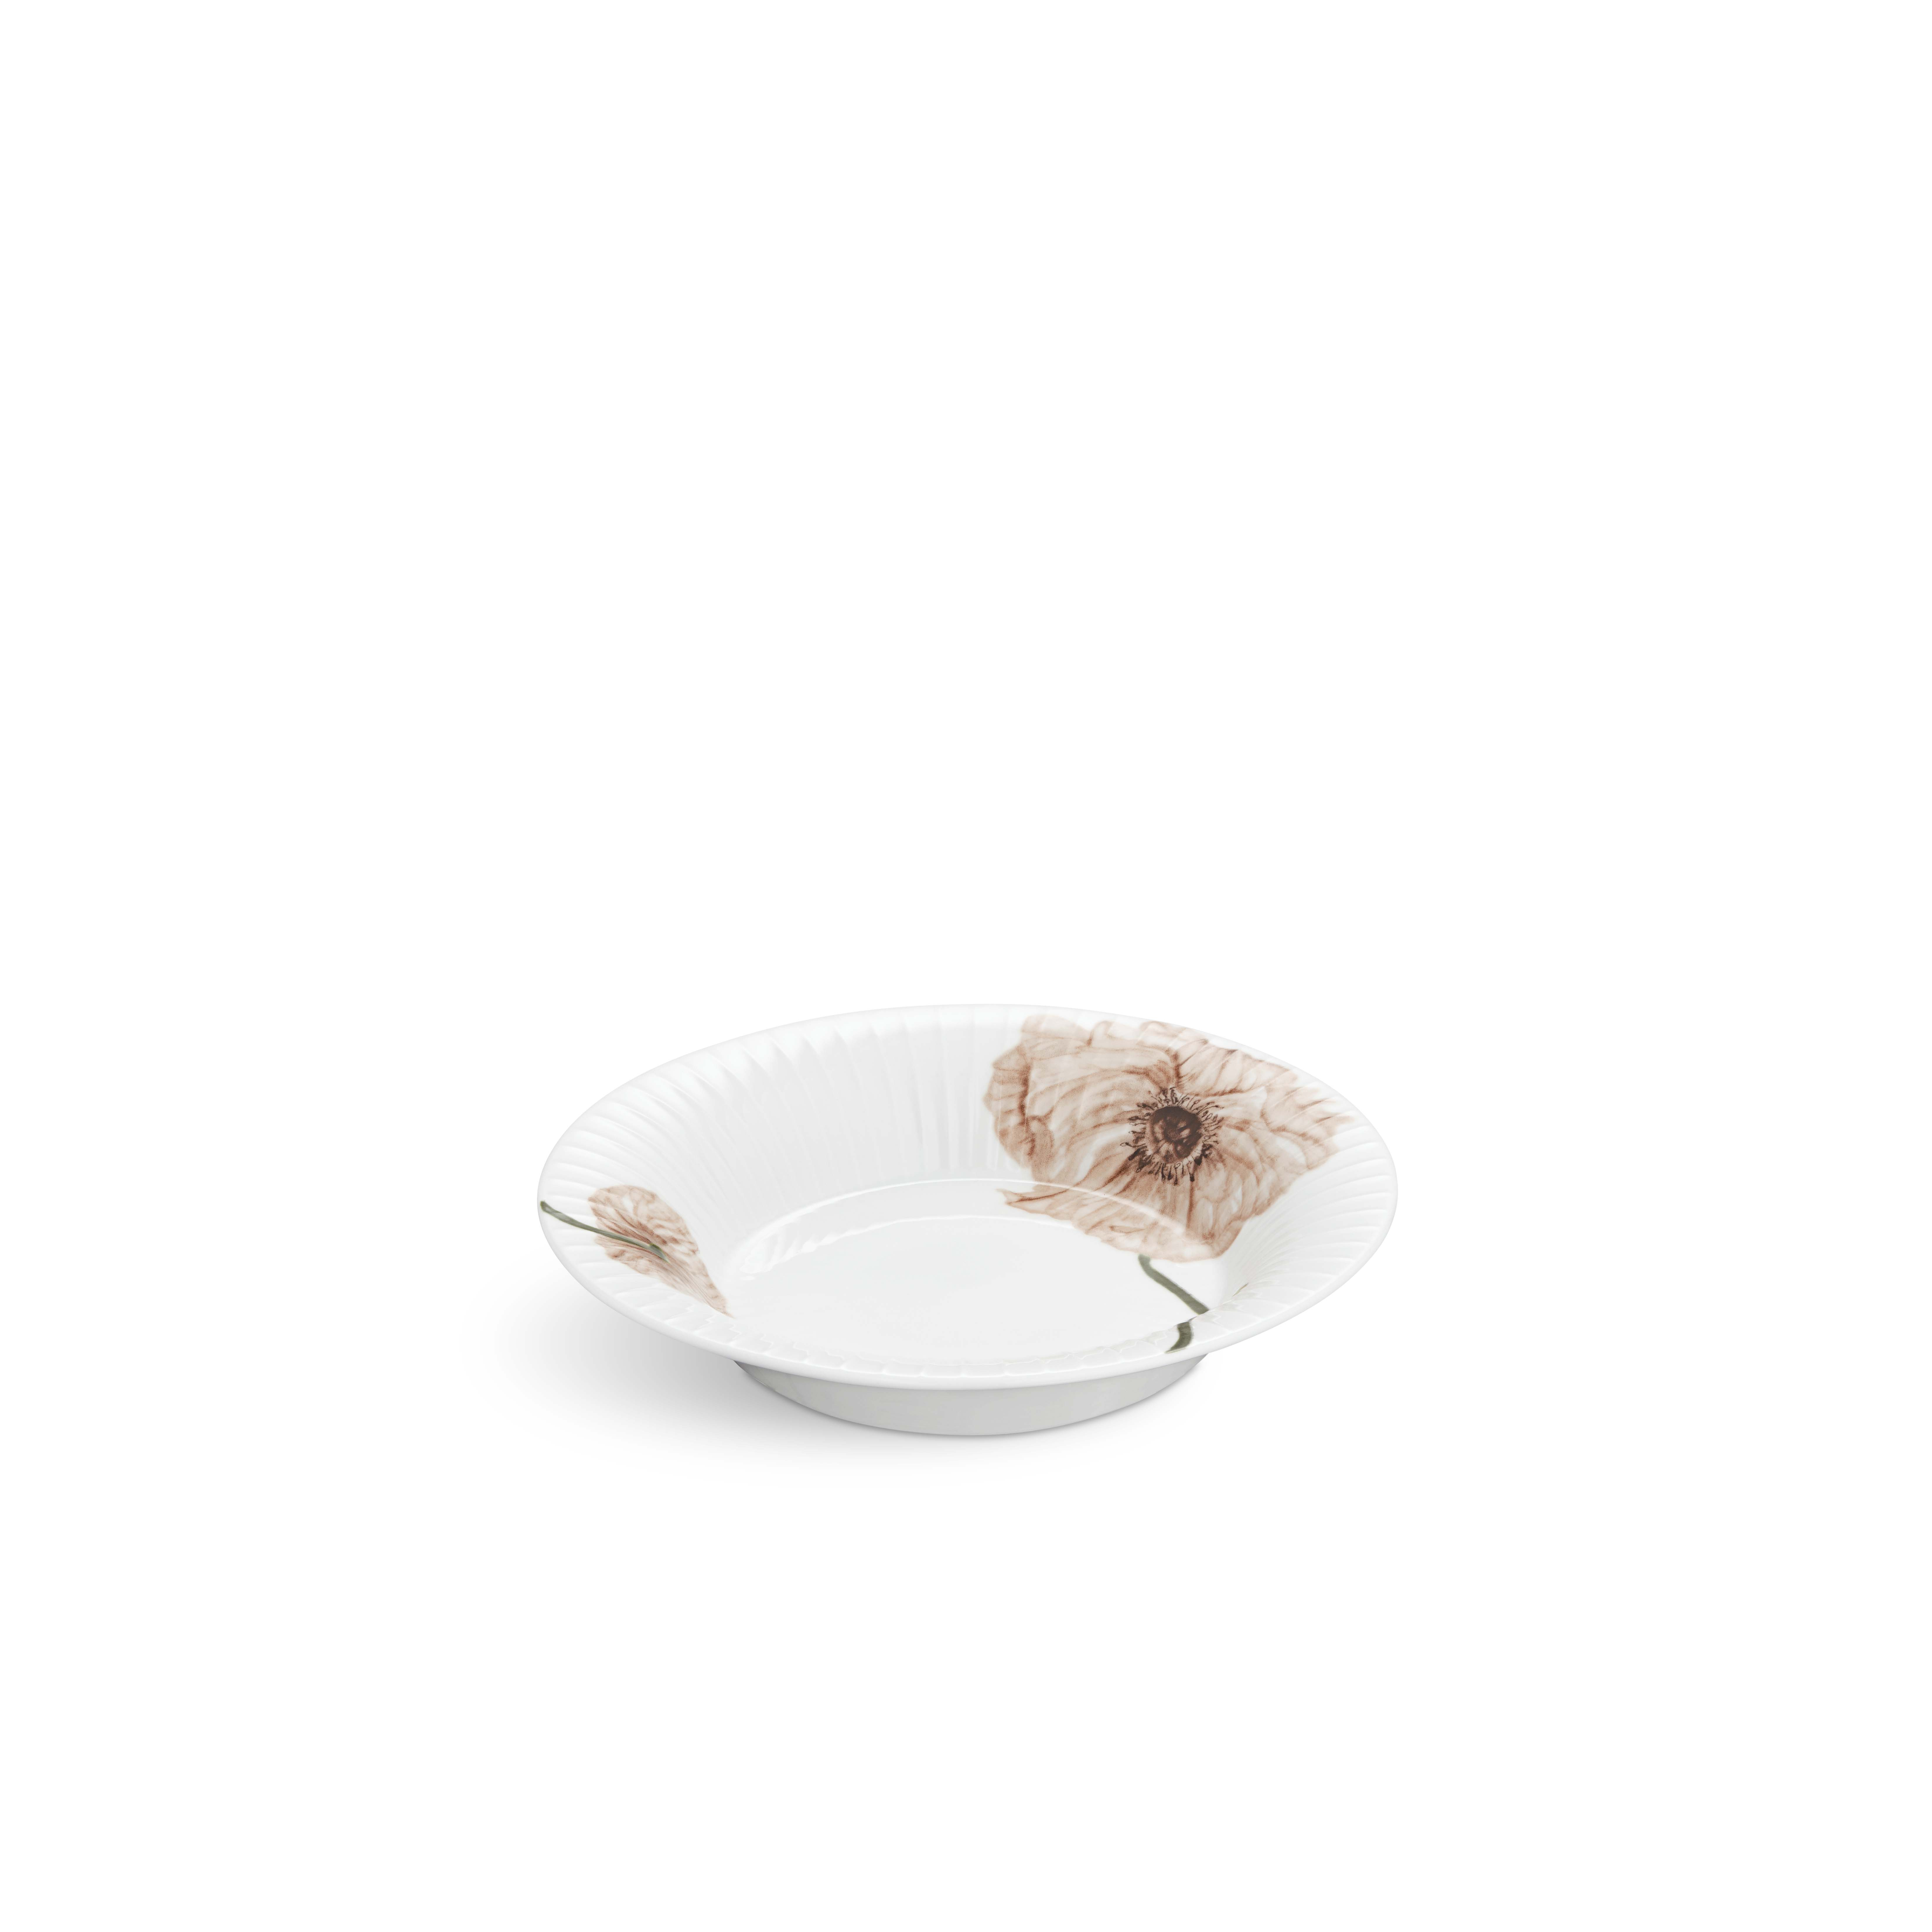 Kähler Hammershøi Poppy dyb tallerken, Ø21 cm, hvid